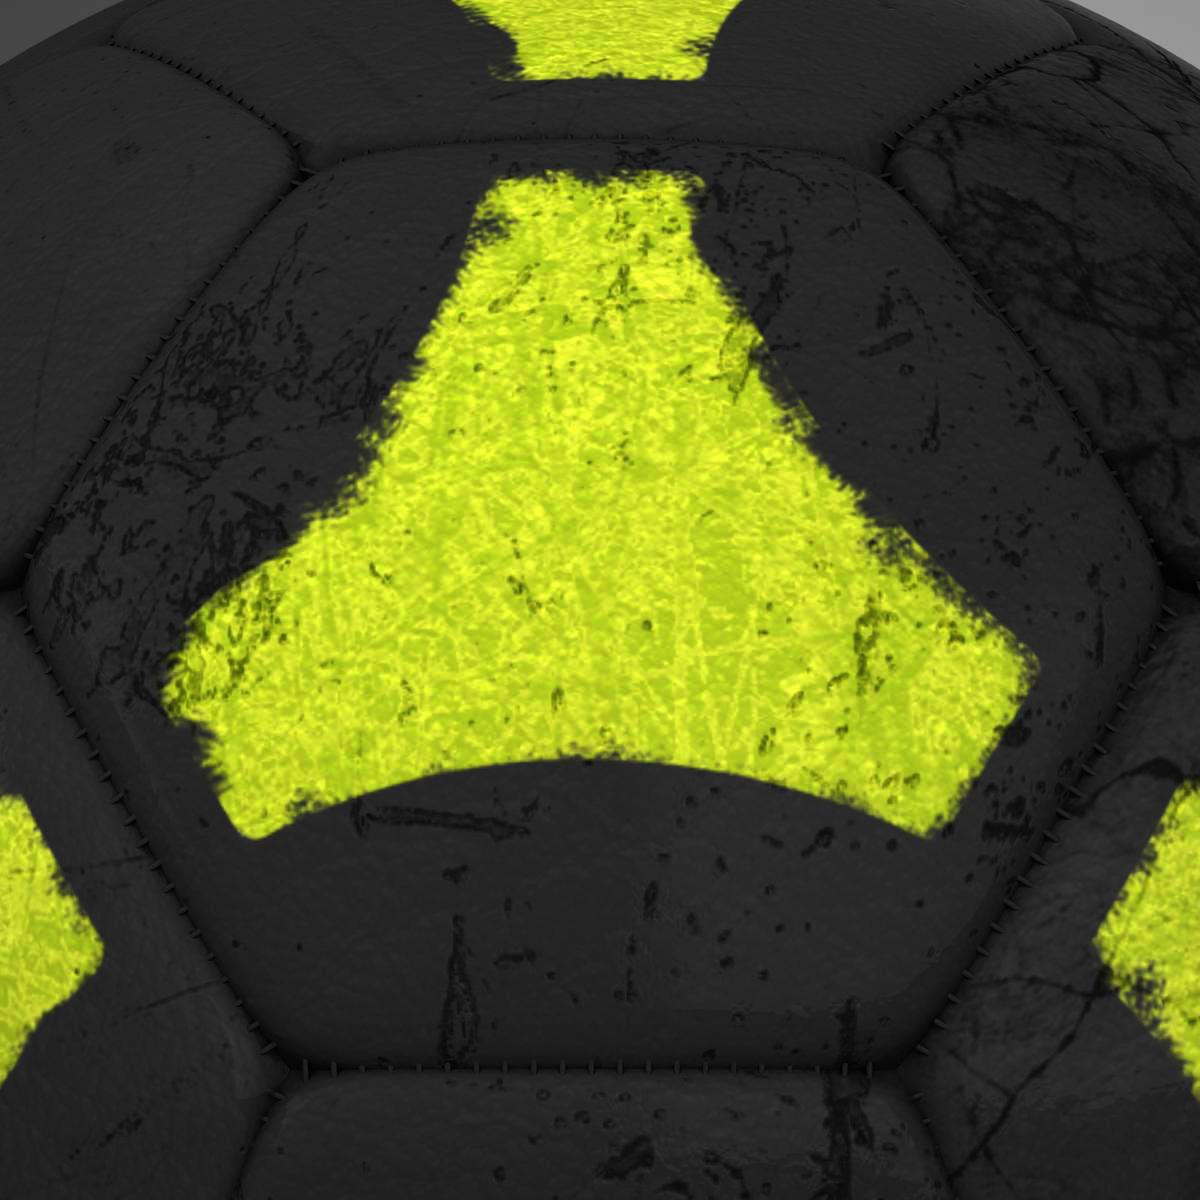 soccerball black yellow 3d model 3ds max fbx c4d ma mb obj 204213